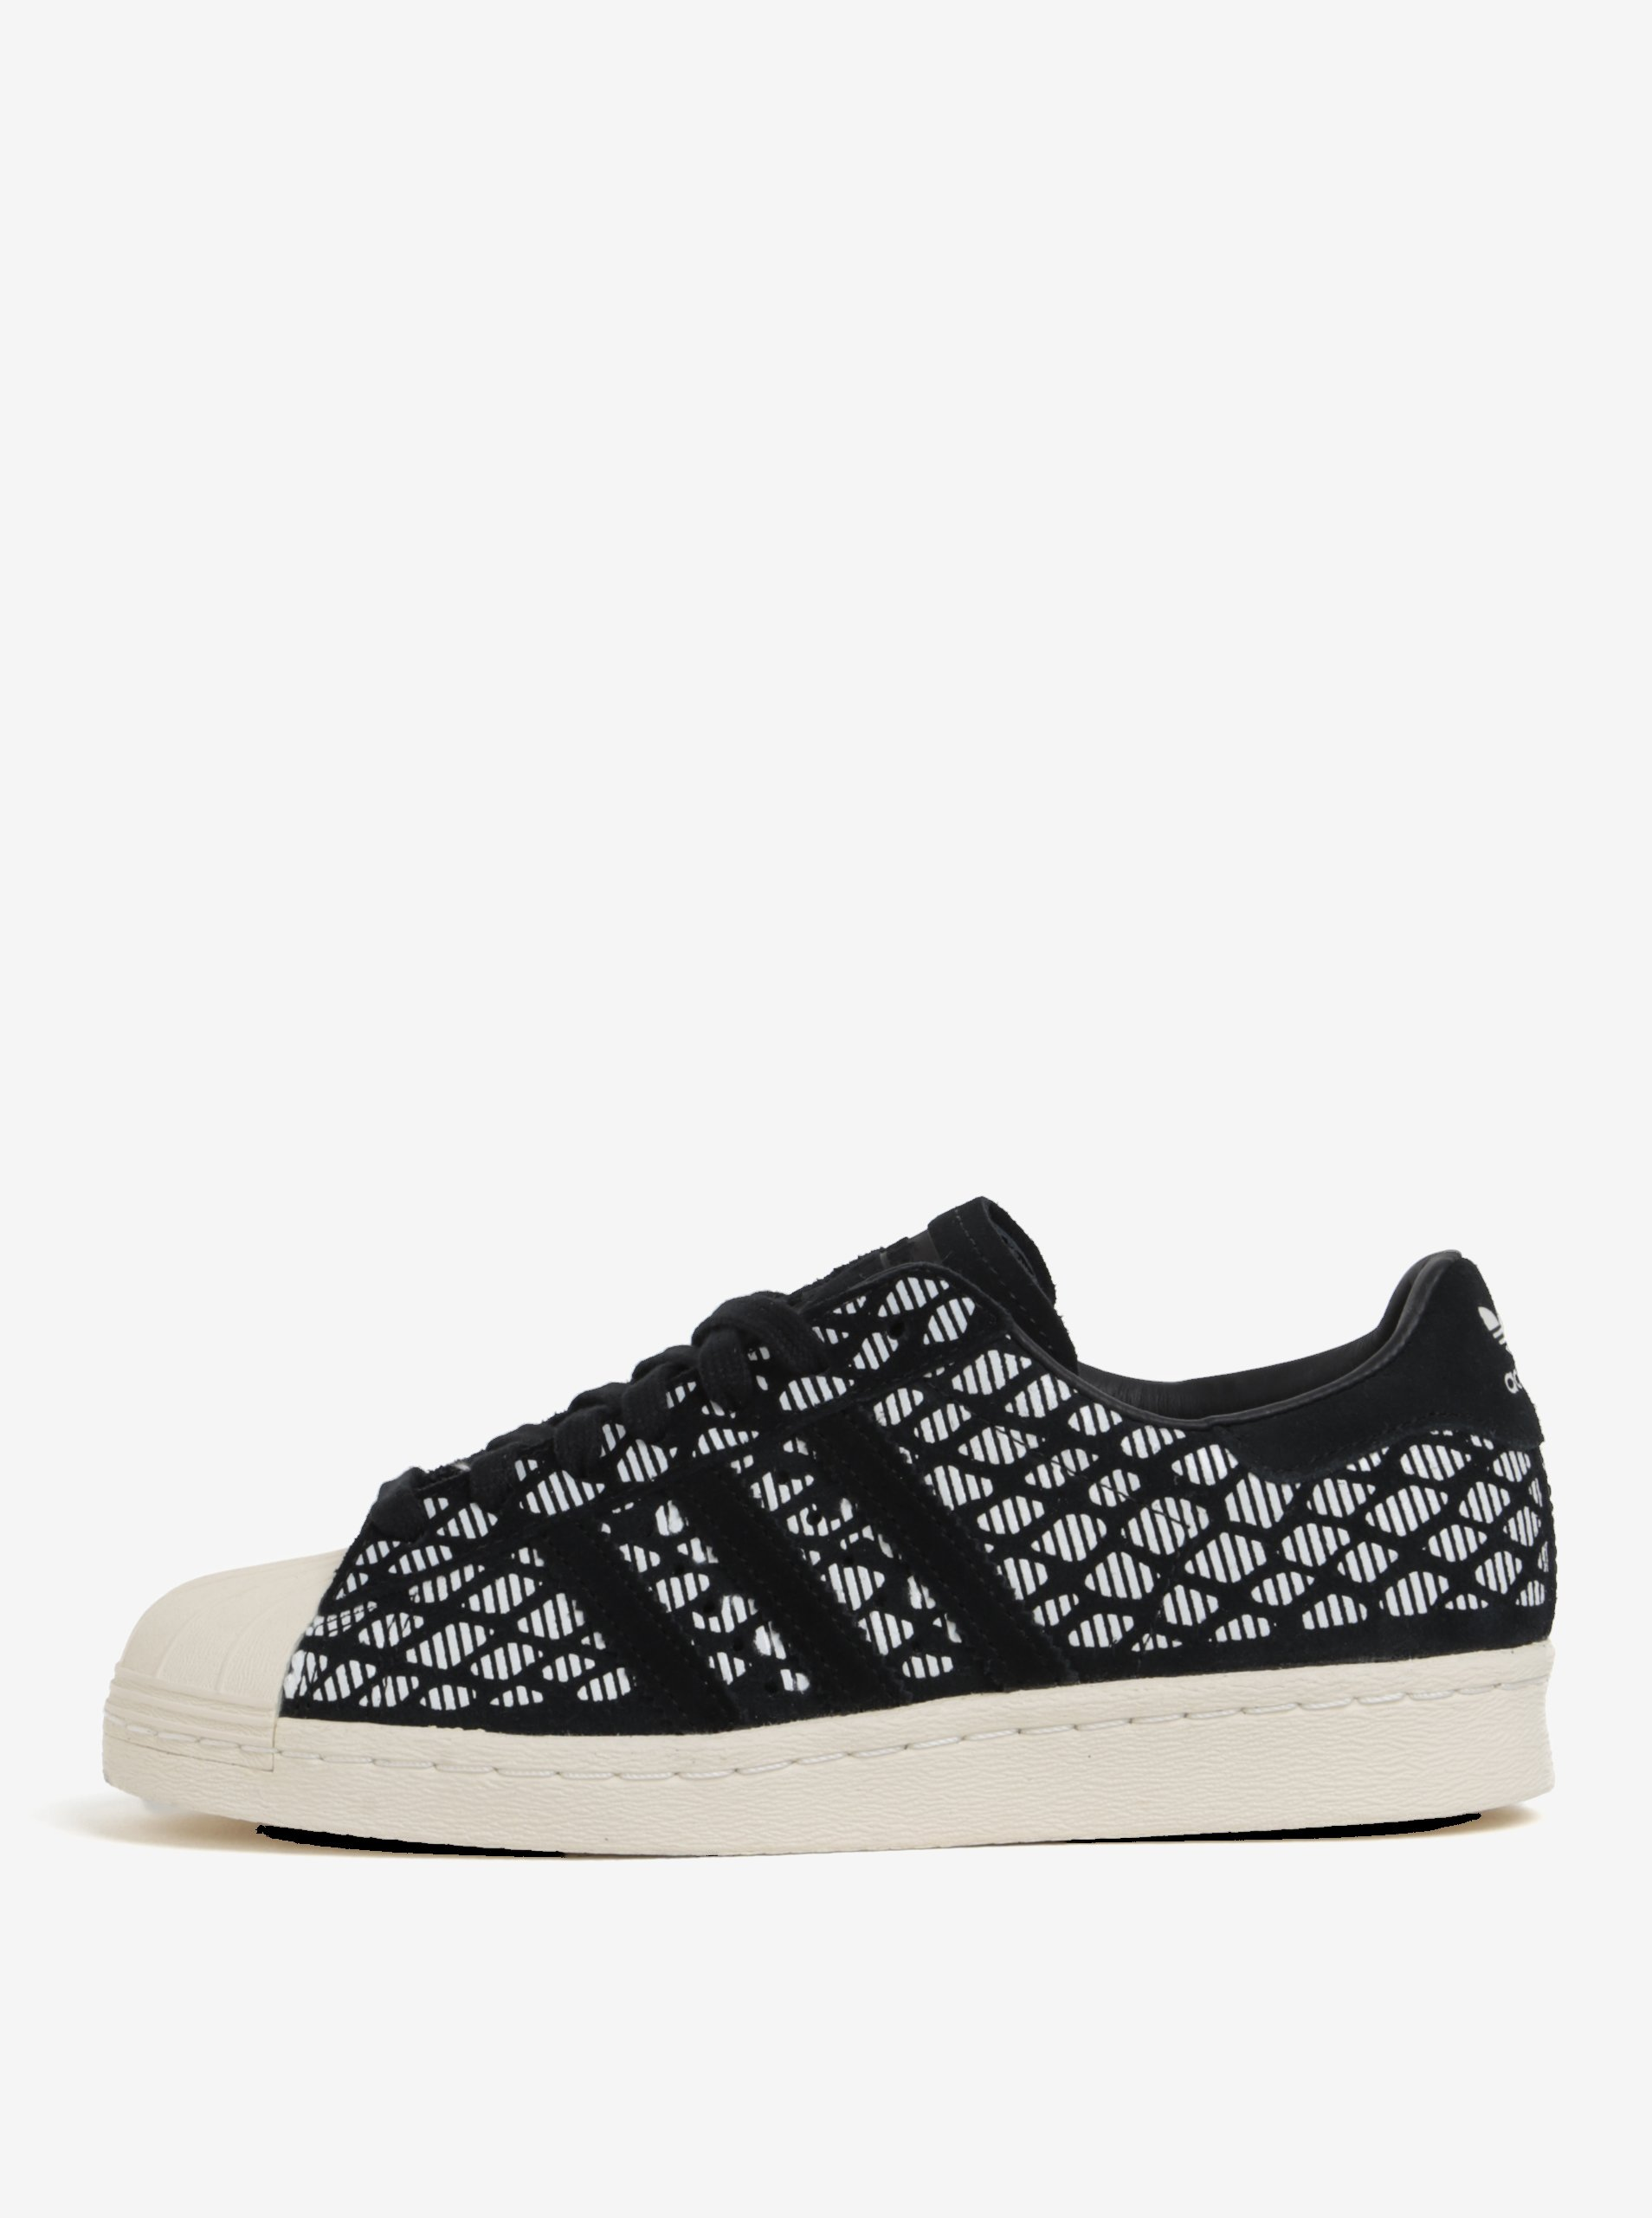 Bílo-černé dámské semišové tenisky adidas Originals Superstar ADIDAS  SUPERSTAR FOUNDATION ... 64975a97ba